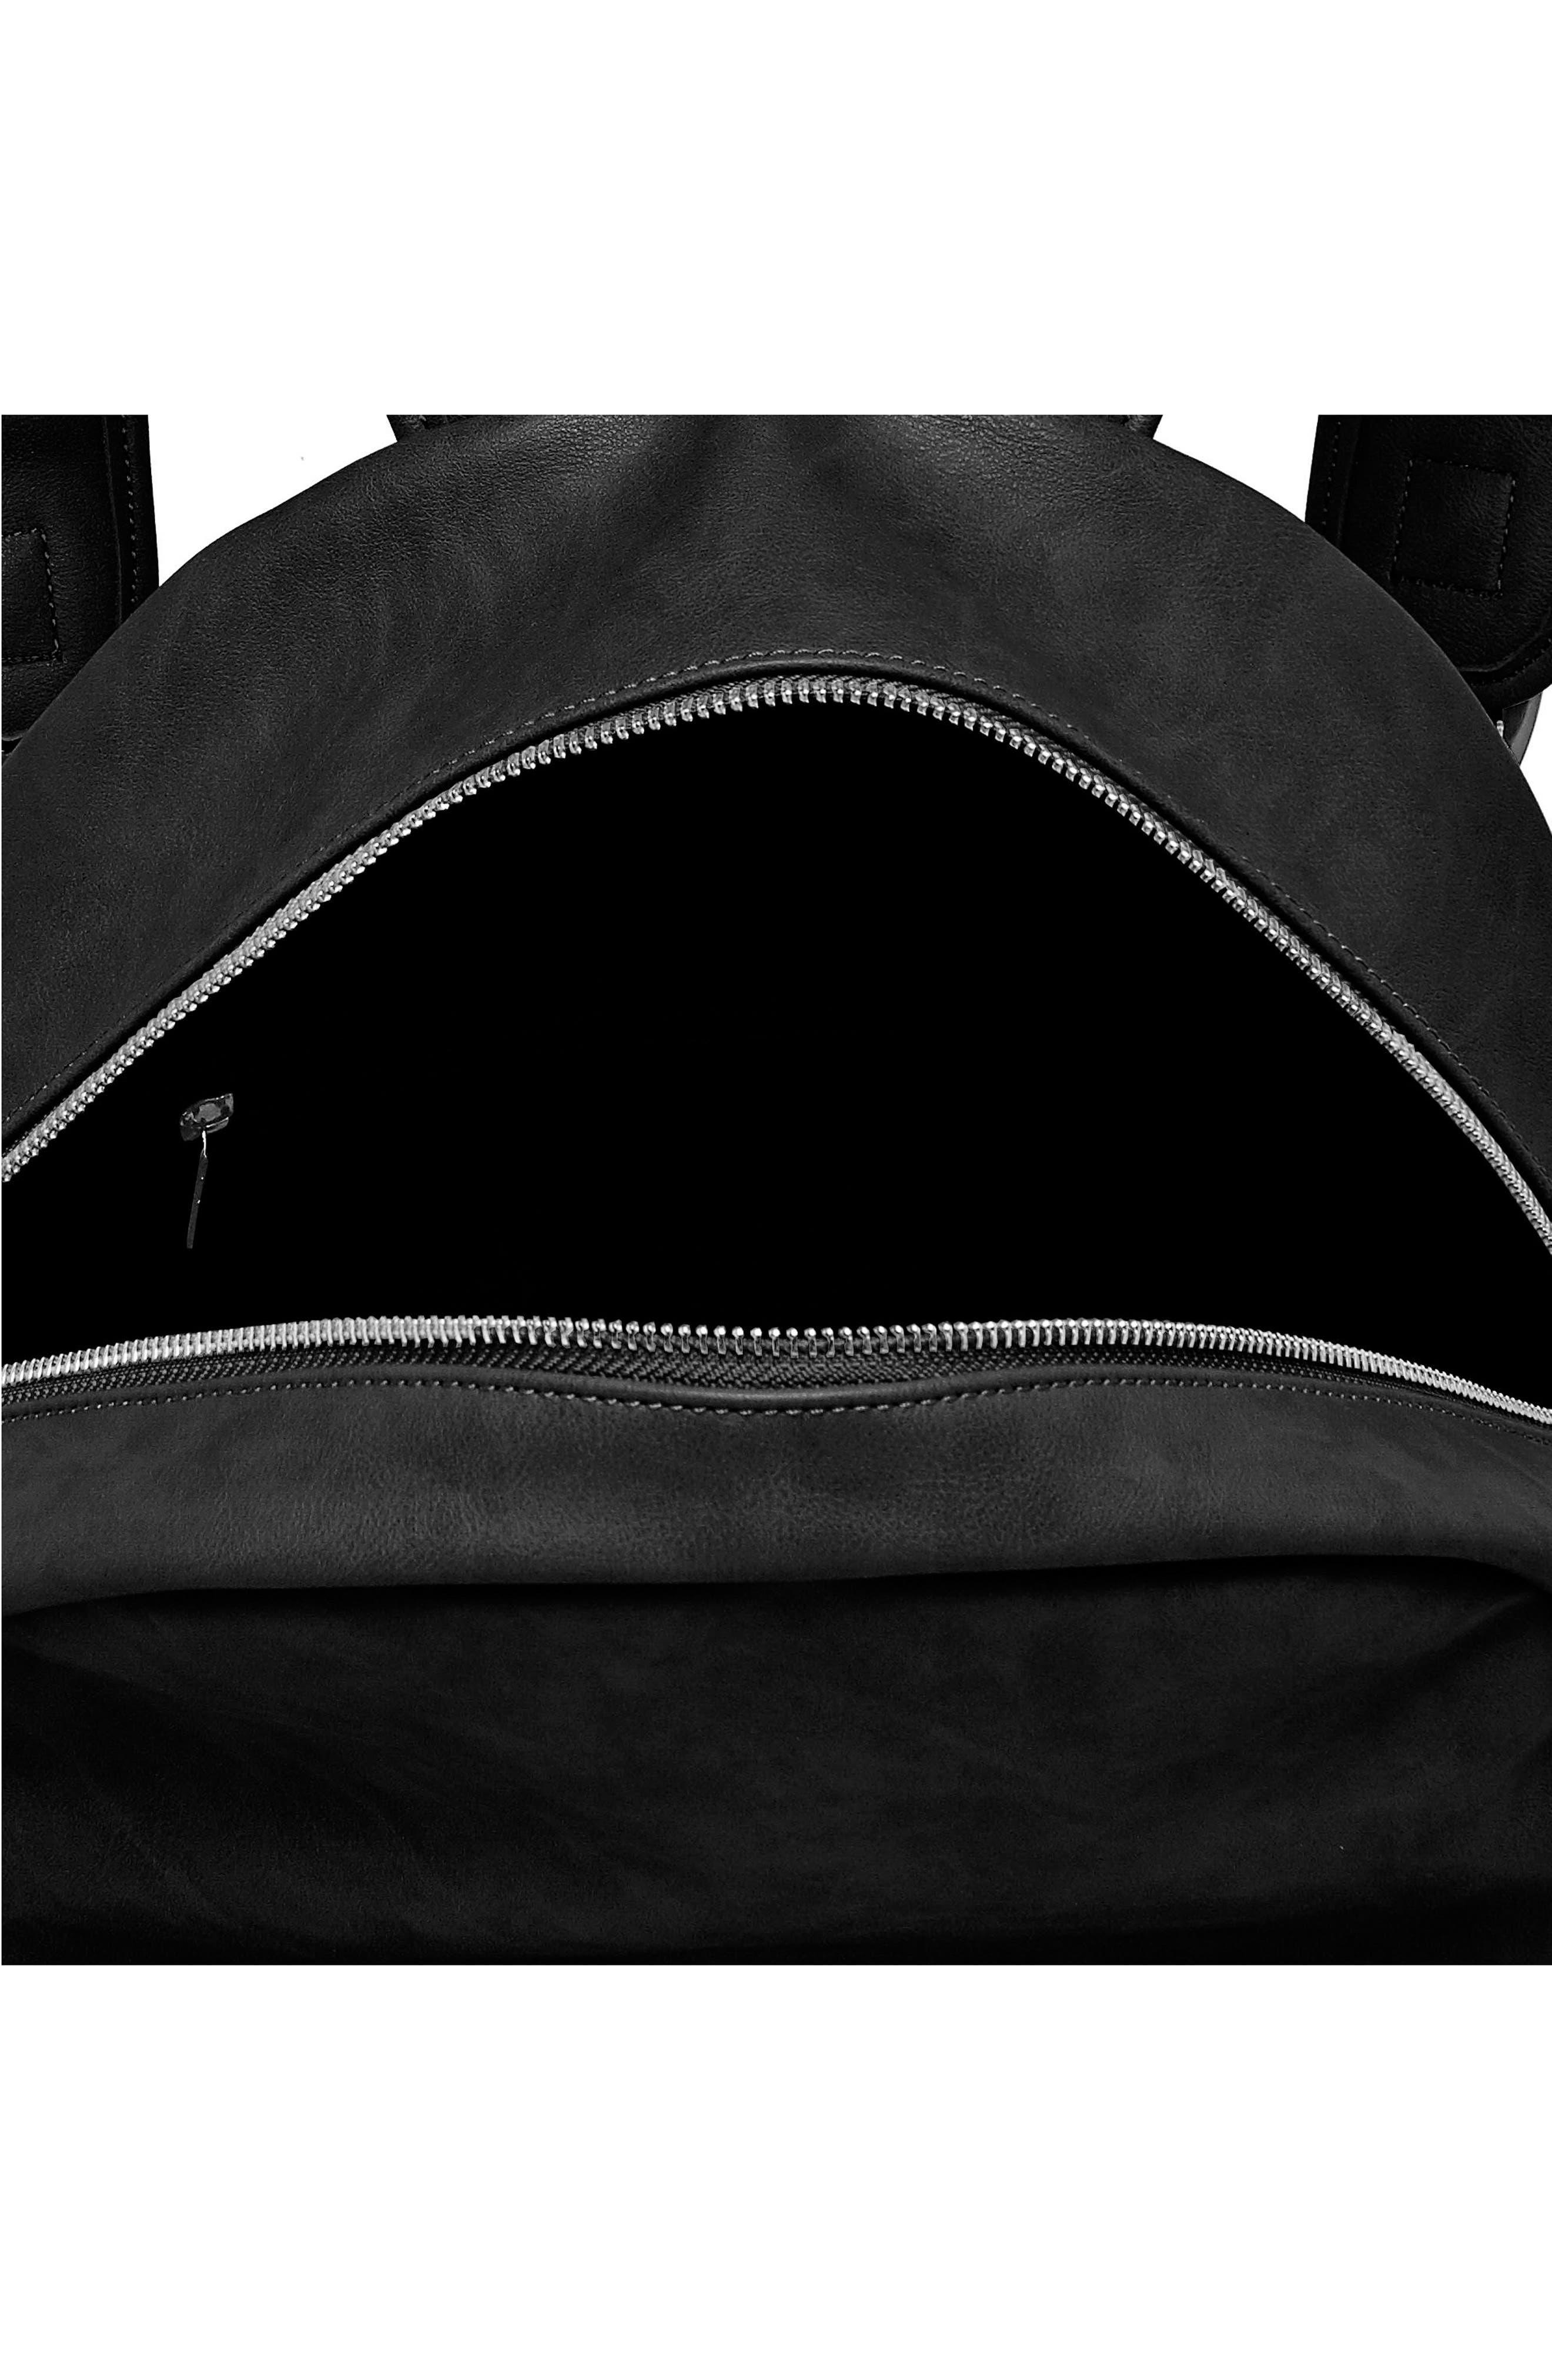 Practical Vegan Leather Backpack,                             Alternate thumbnail 3, color,                             001